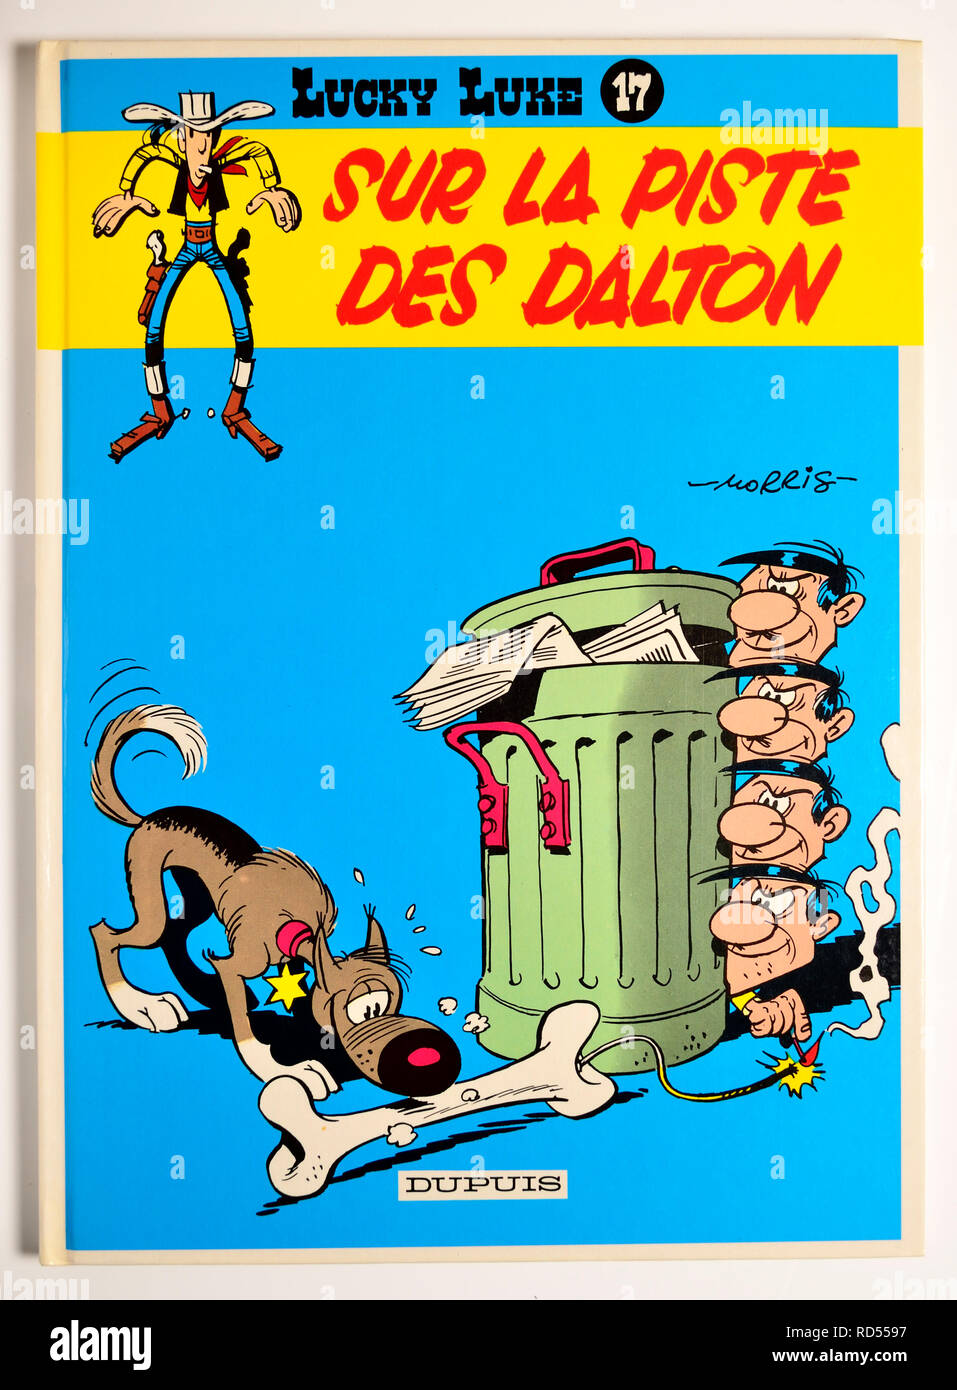 Lucky Luke comic book - Sur la Piste des Dalton (on the Trail of the Daltons) - Stock Image